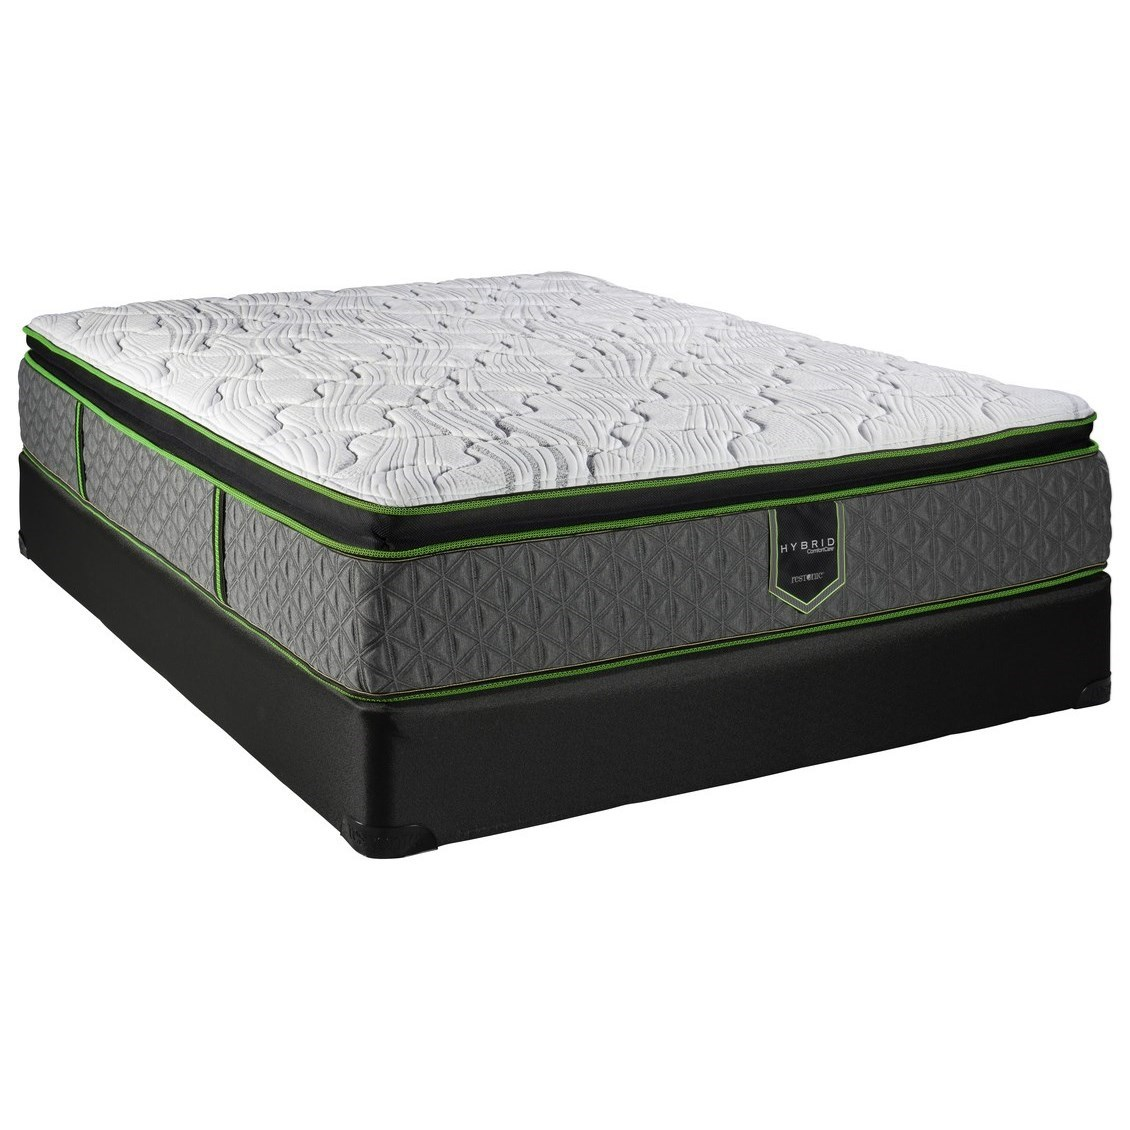 King Pillow Top Hybrid Low Profile Set